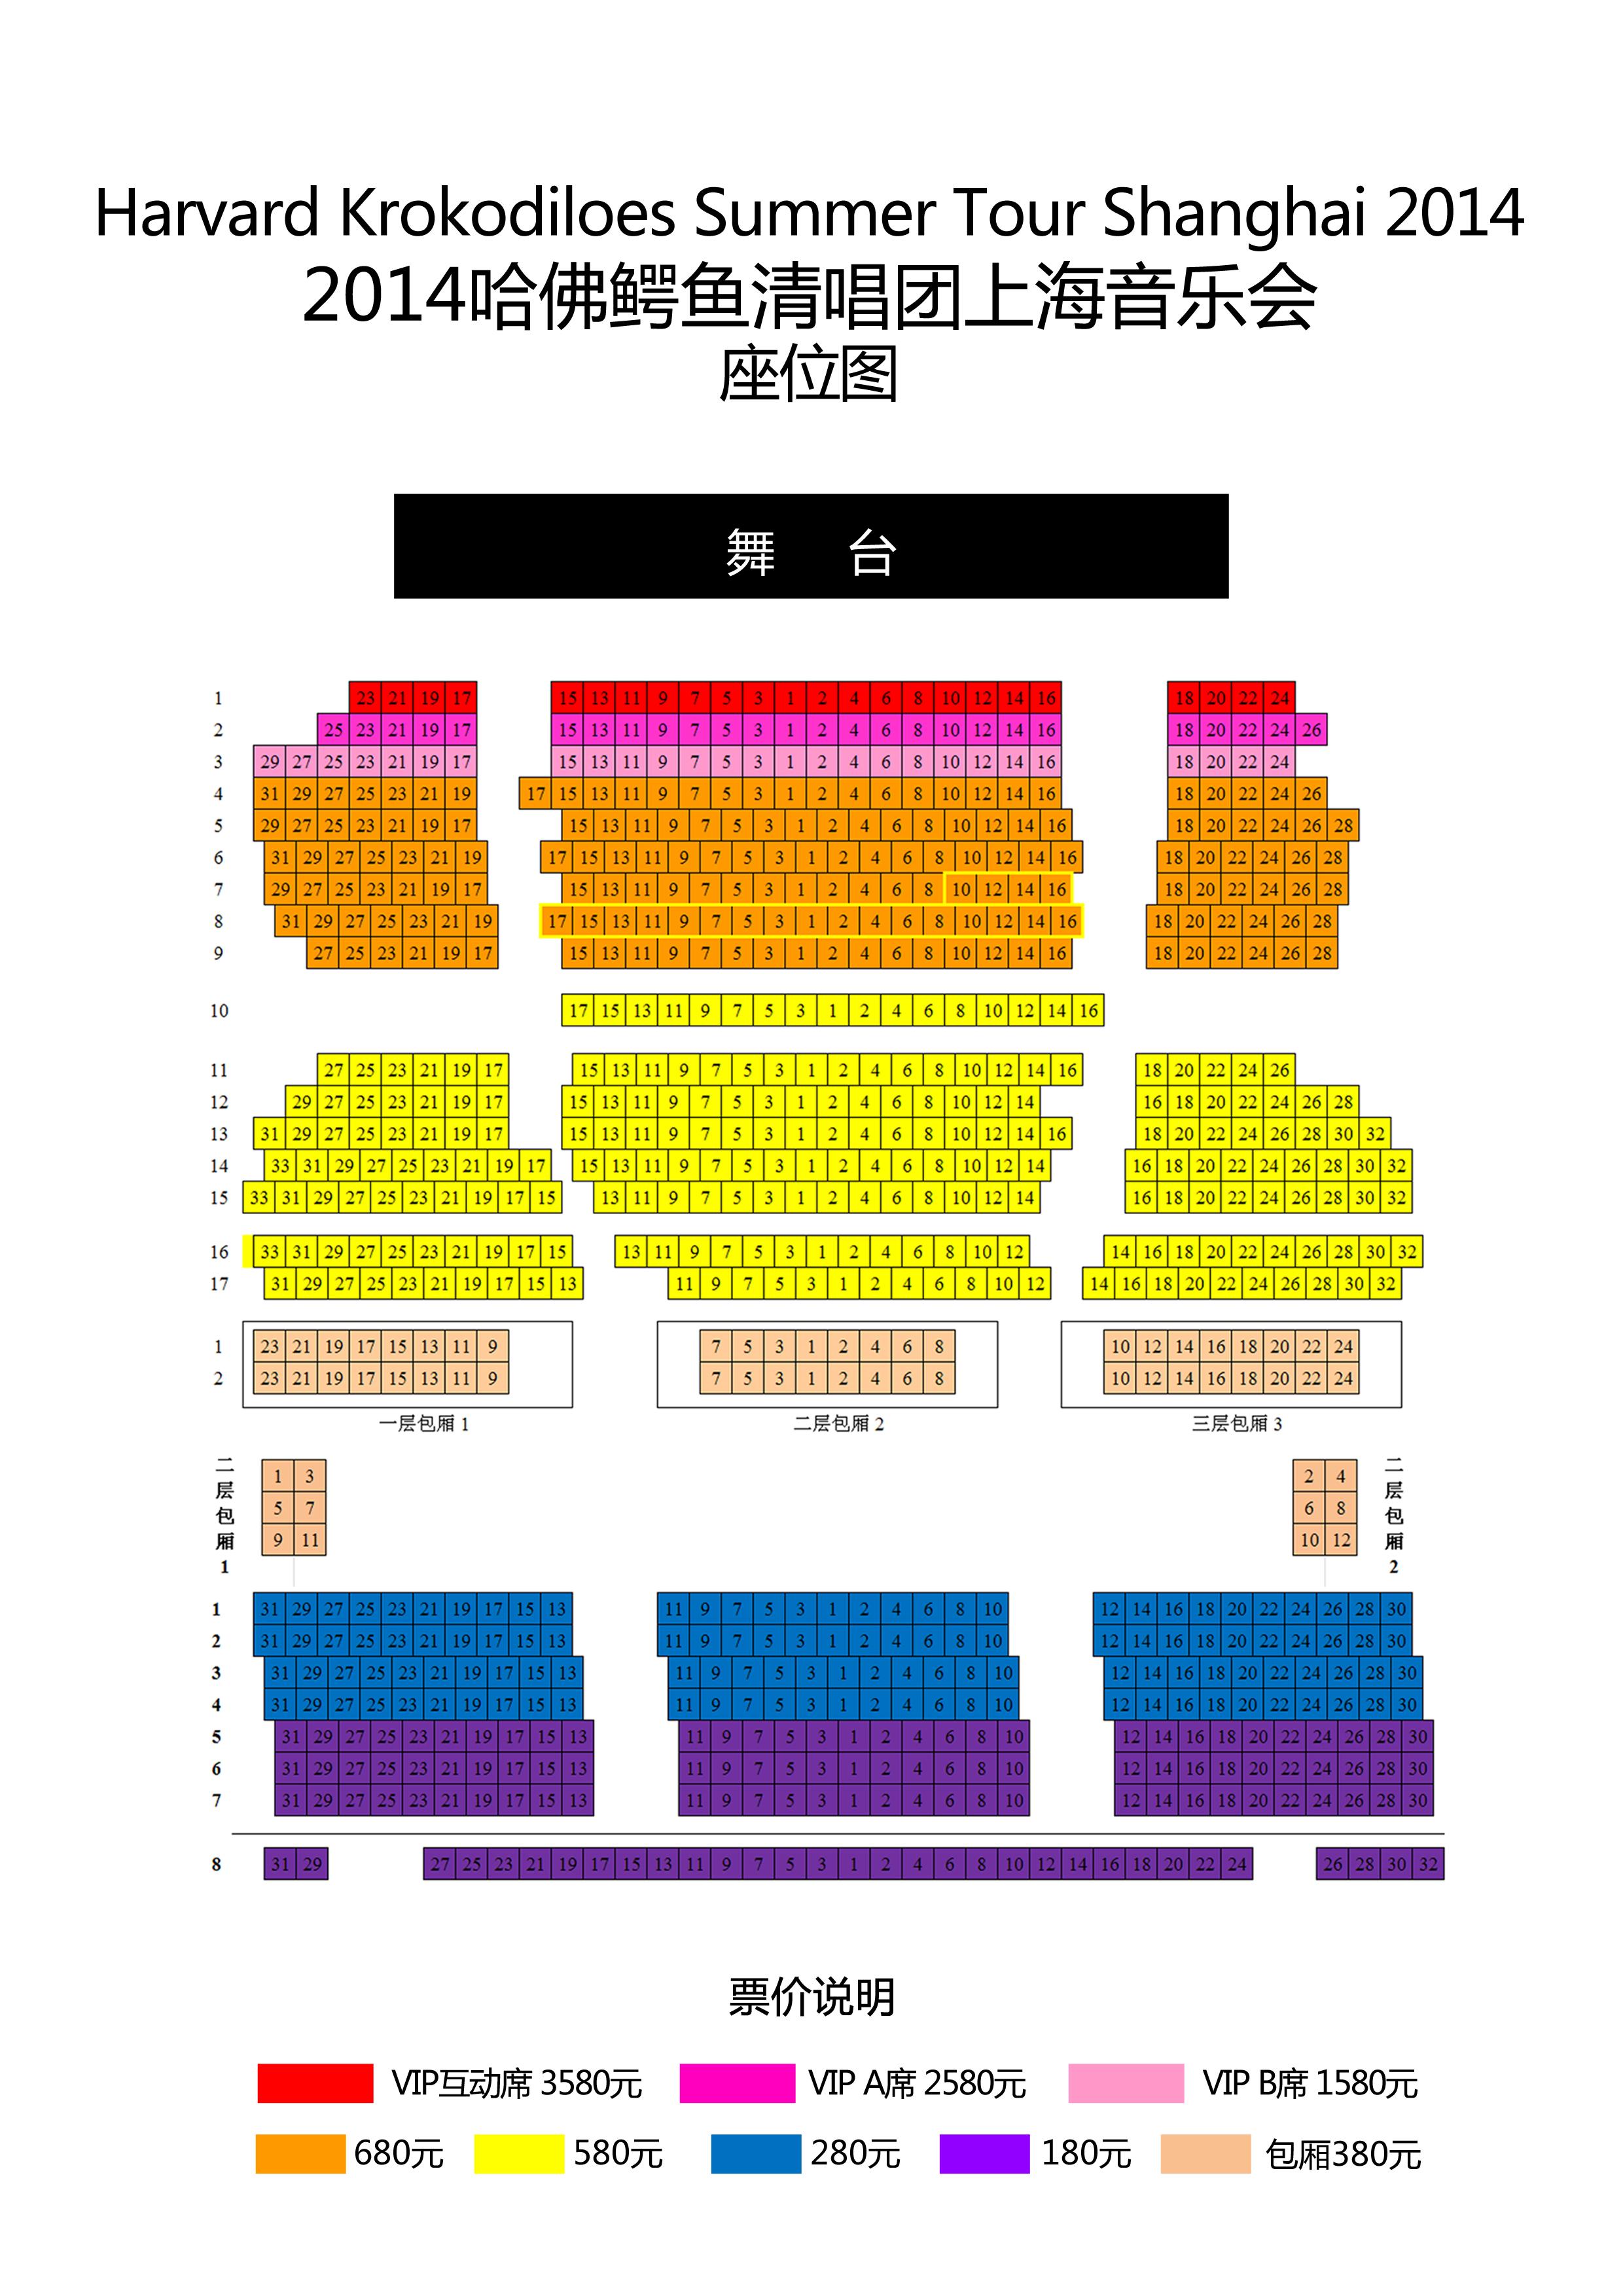 concert-seat-map